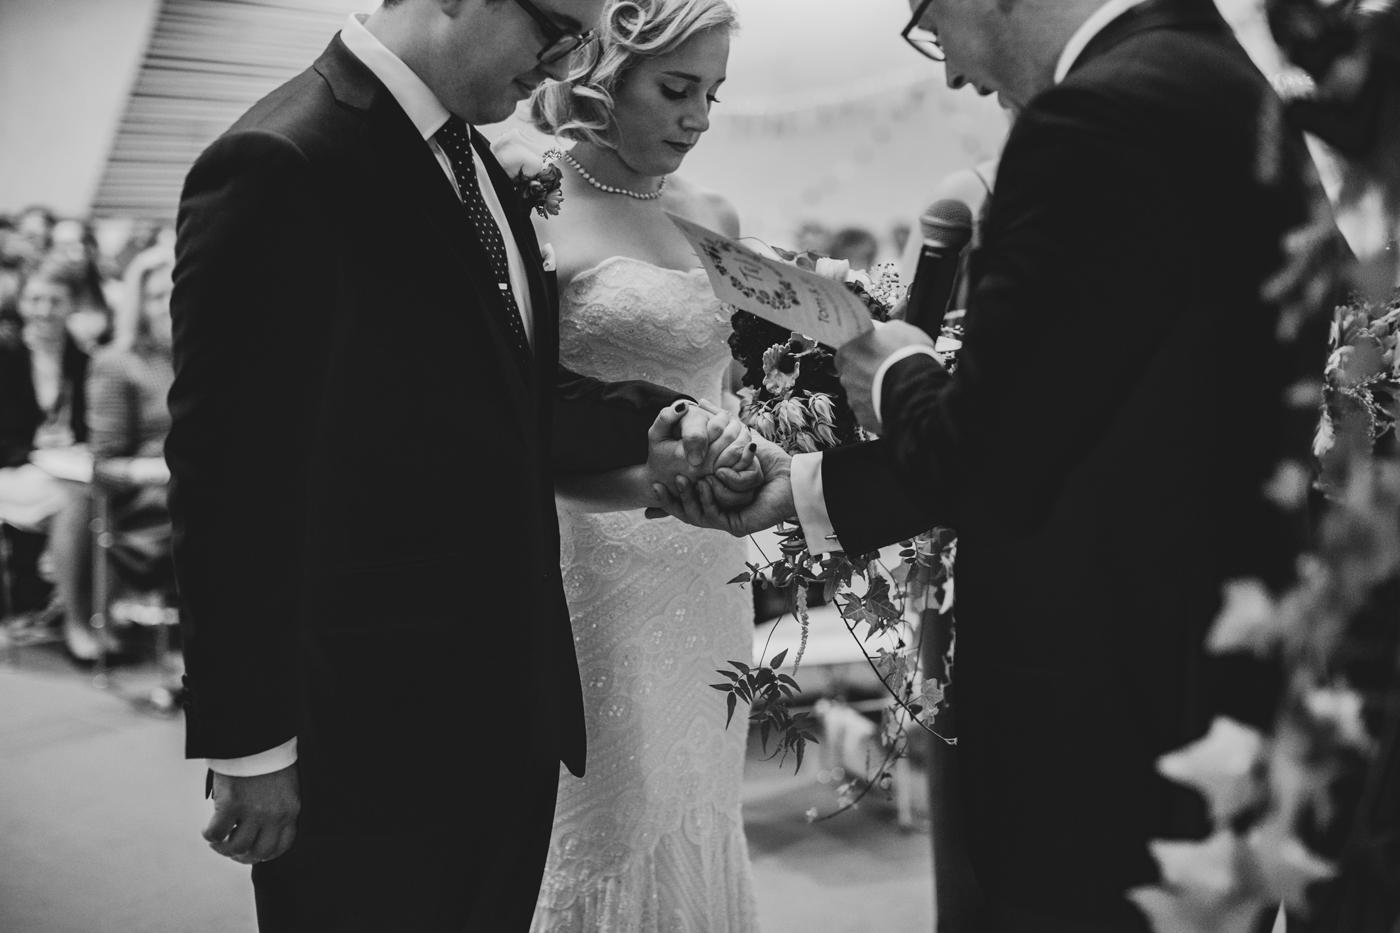 Jo & Tom Wedding - The Grounds of Alexandria - Samantha Heather Photography-105.jpg